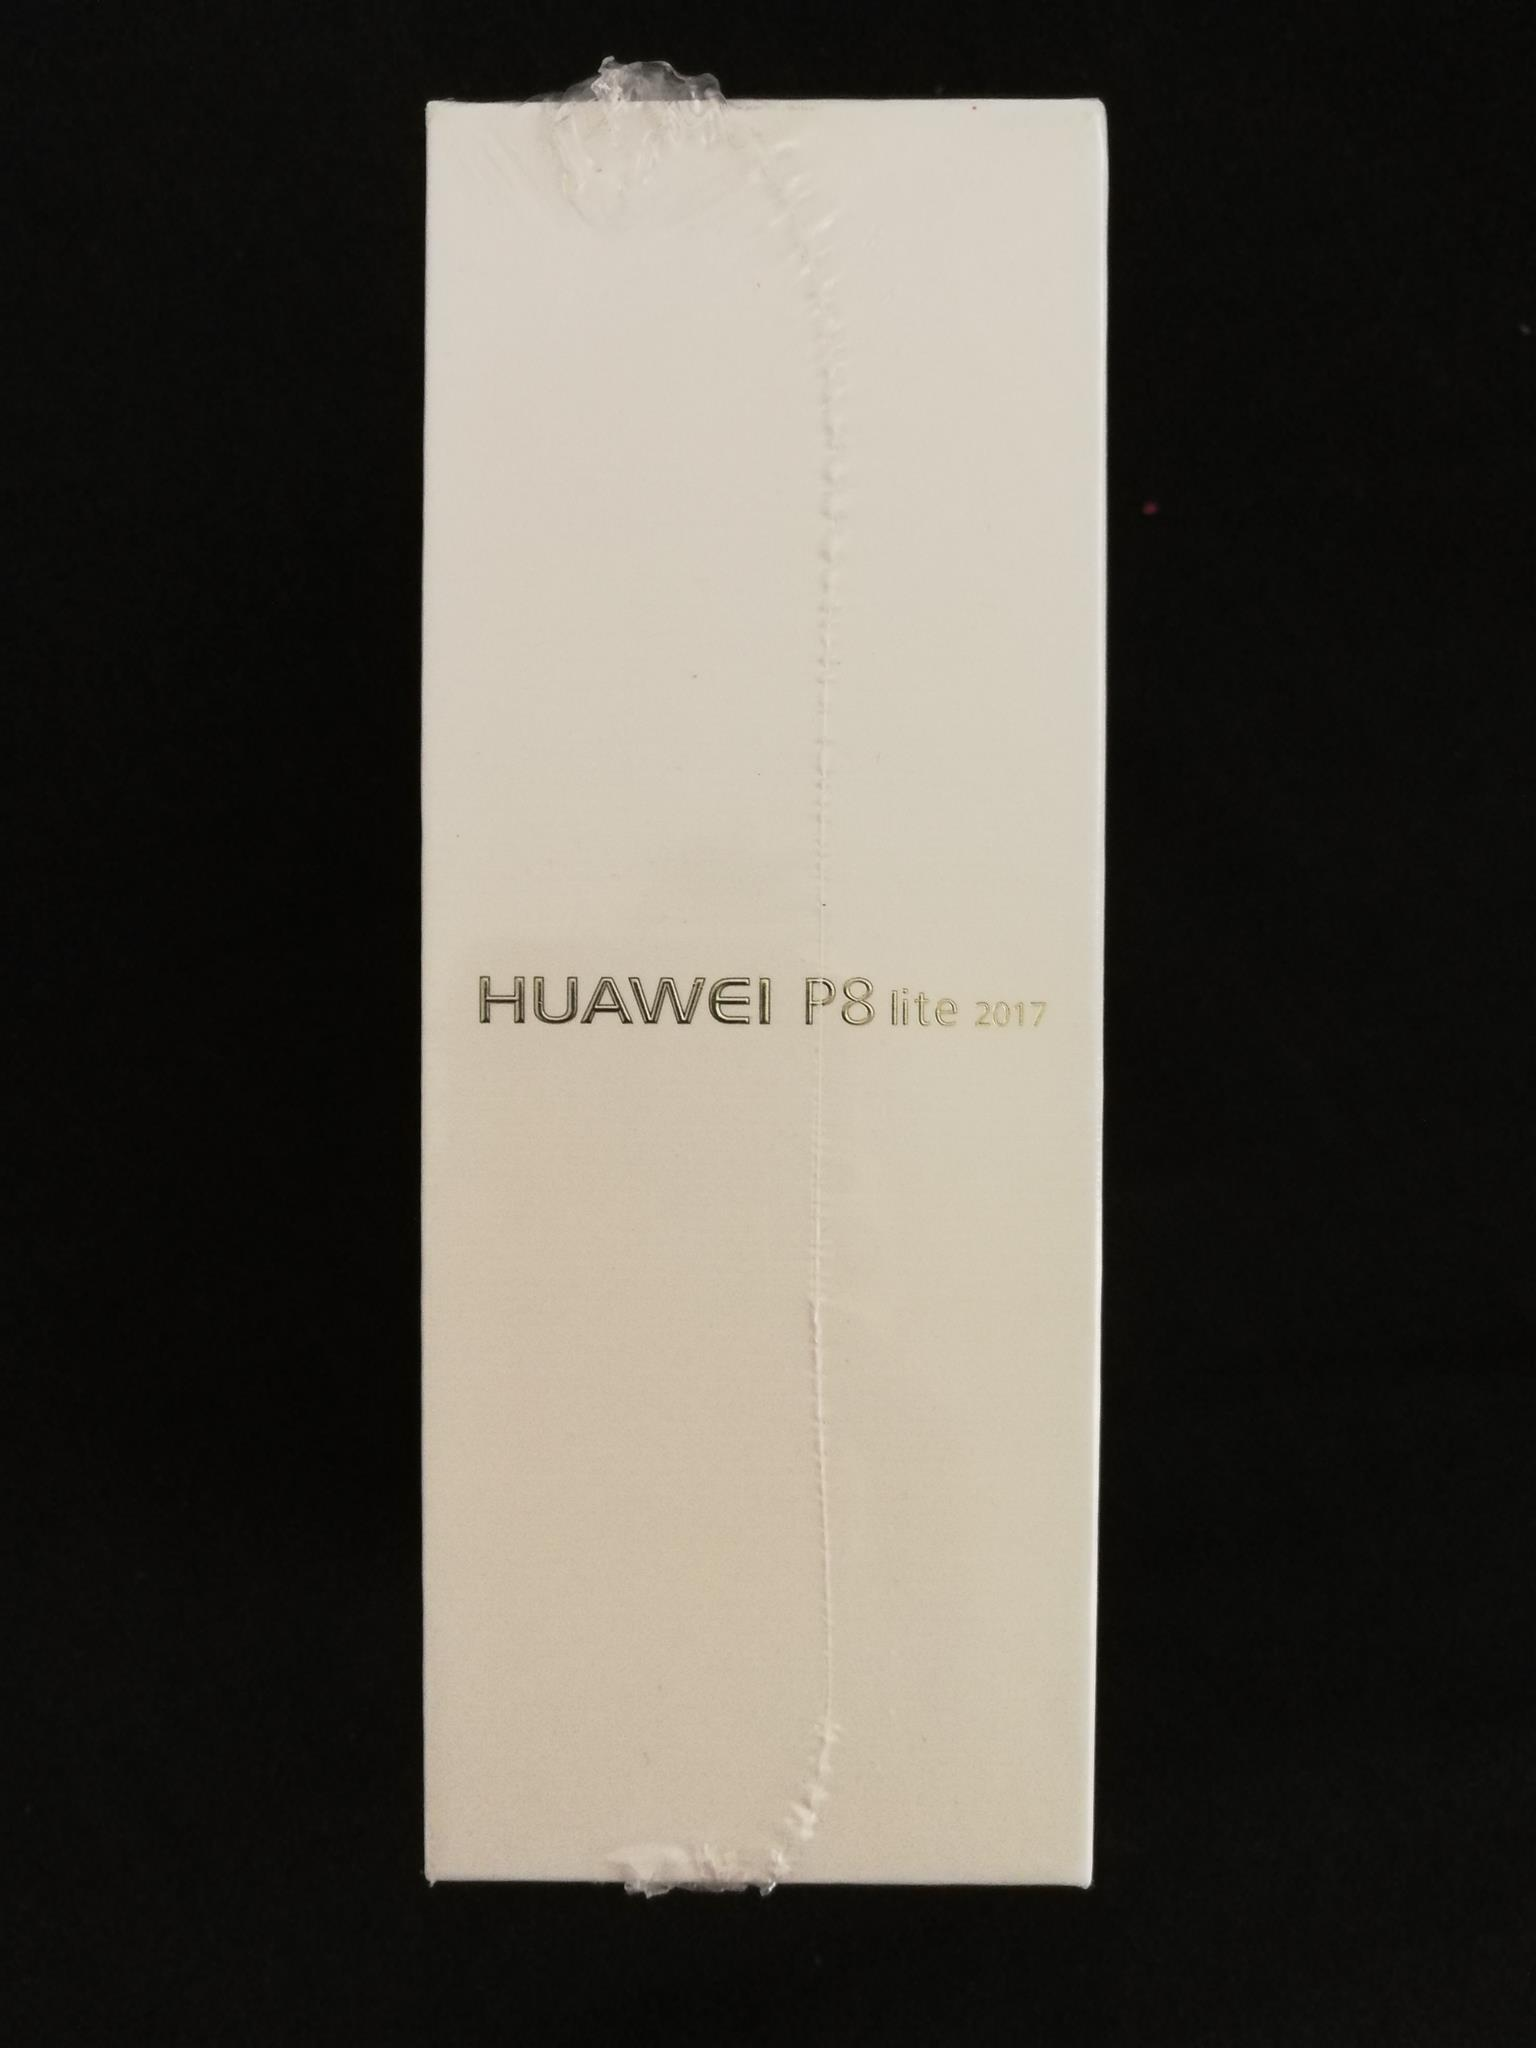 Brand new hauwei p8 lite | Junk Mail